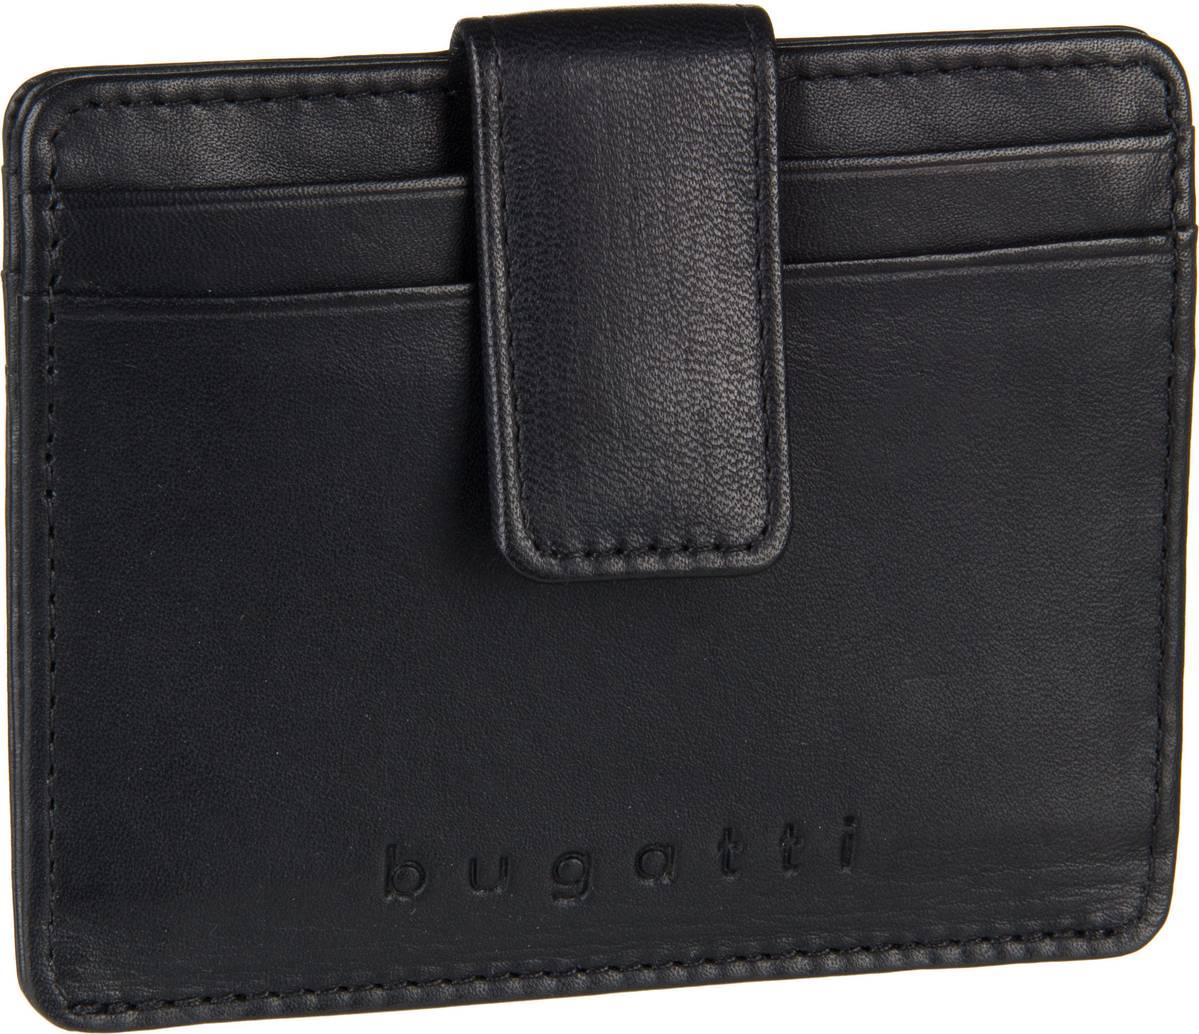 Bugatti Primo RFID 3271 Schwarz - Kreditkartenetui